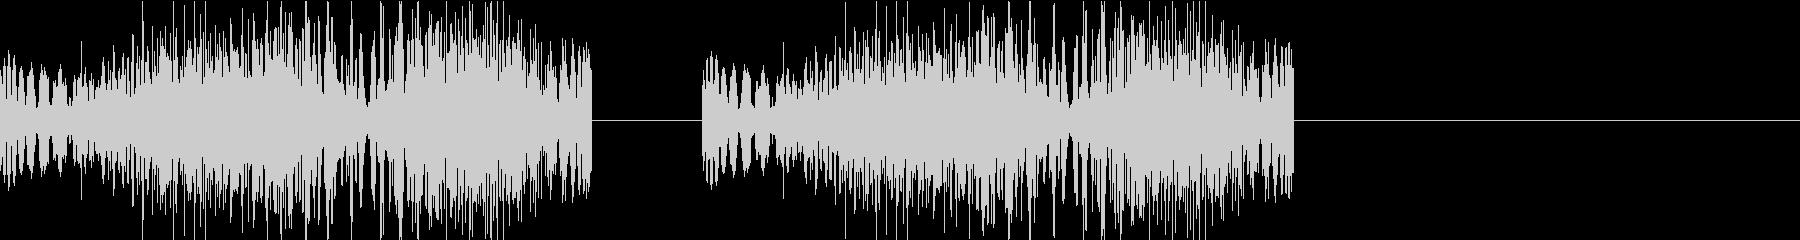 DJプレイ スクラッチ・ノイズ 315の未再生の波形